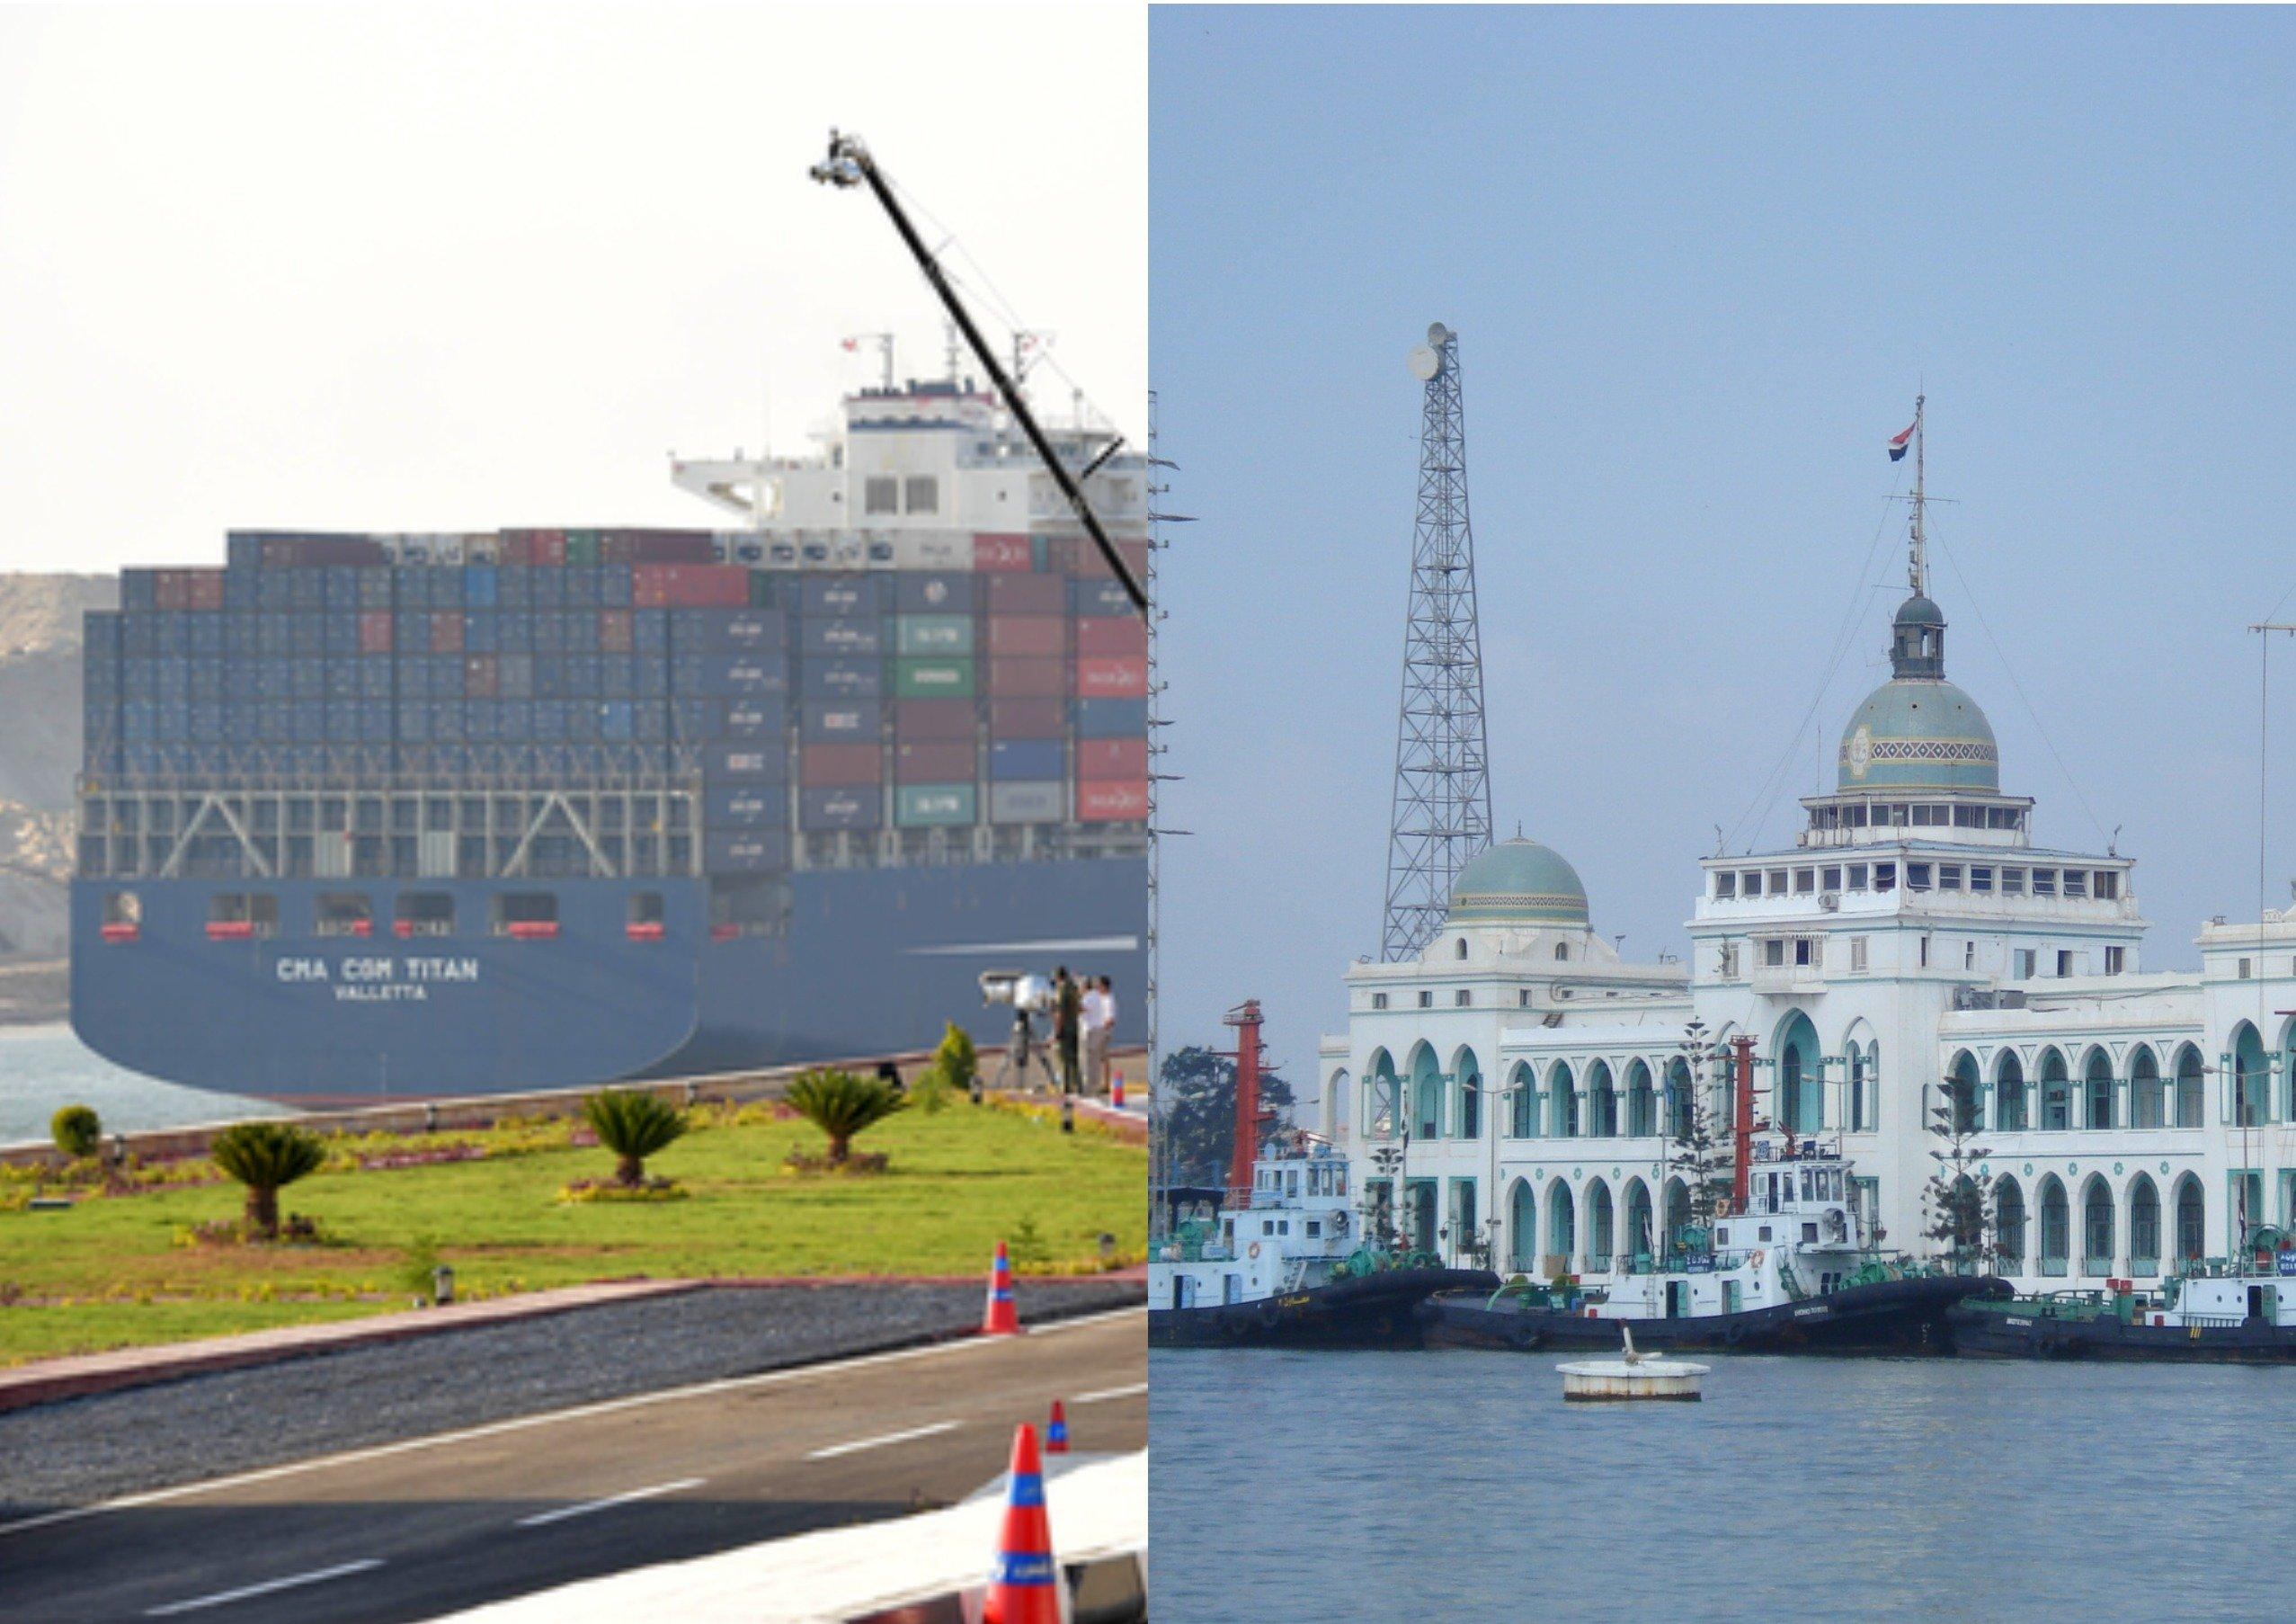 Россия расширяет свою «зону влияния» на территории Суэцкого канала